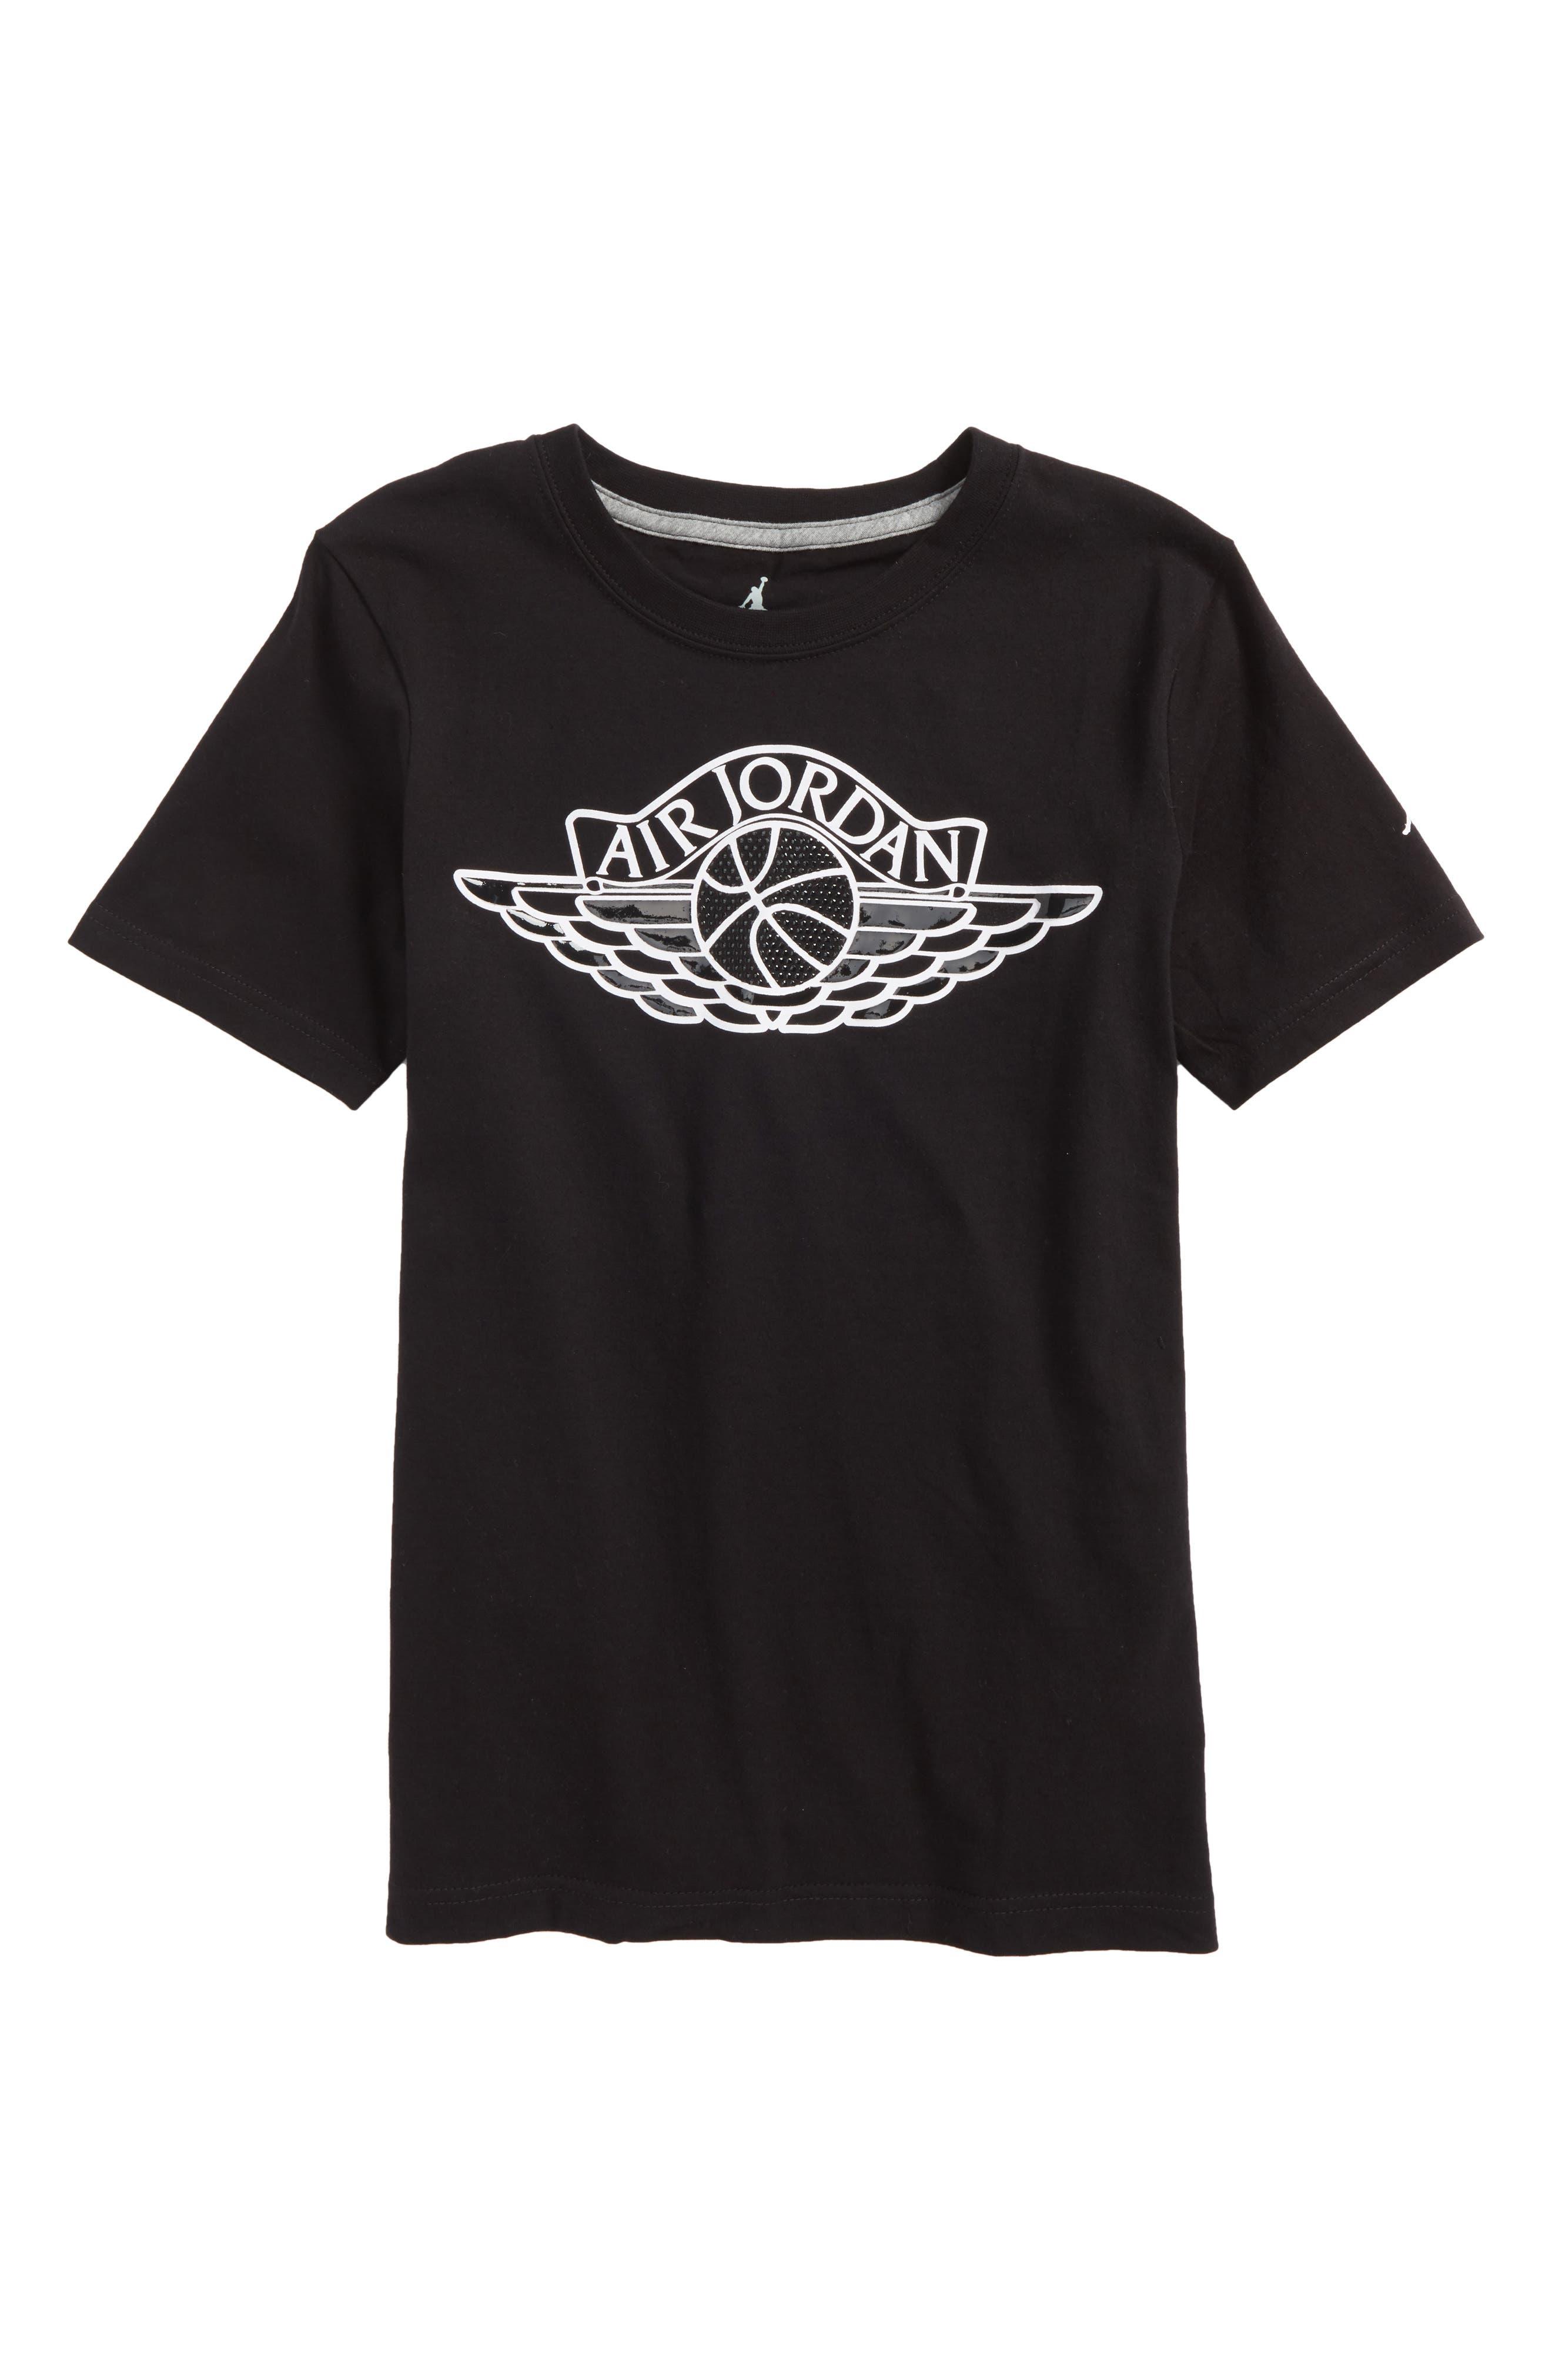 Jordan MJSW Read 5 T-Shirt,                             Main thumbnail 1, color,                             Black